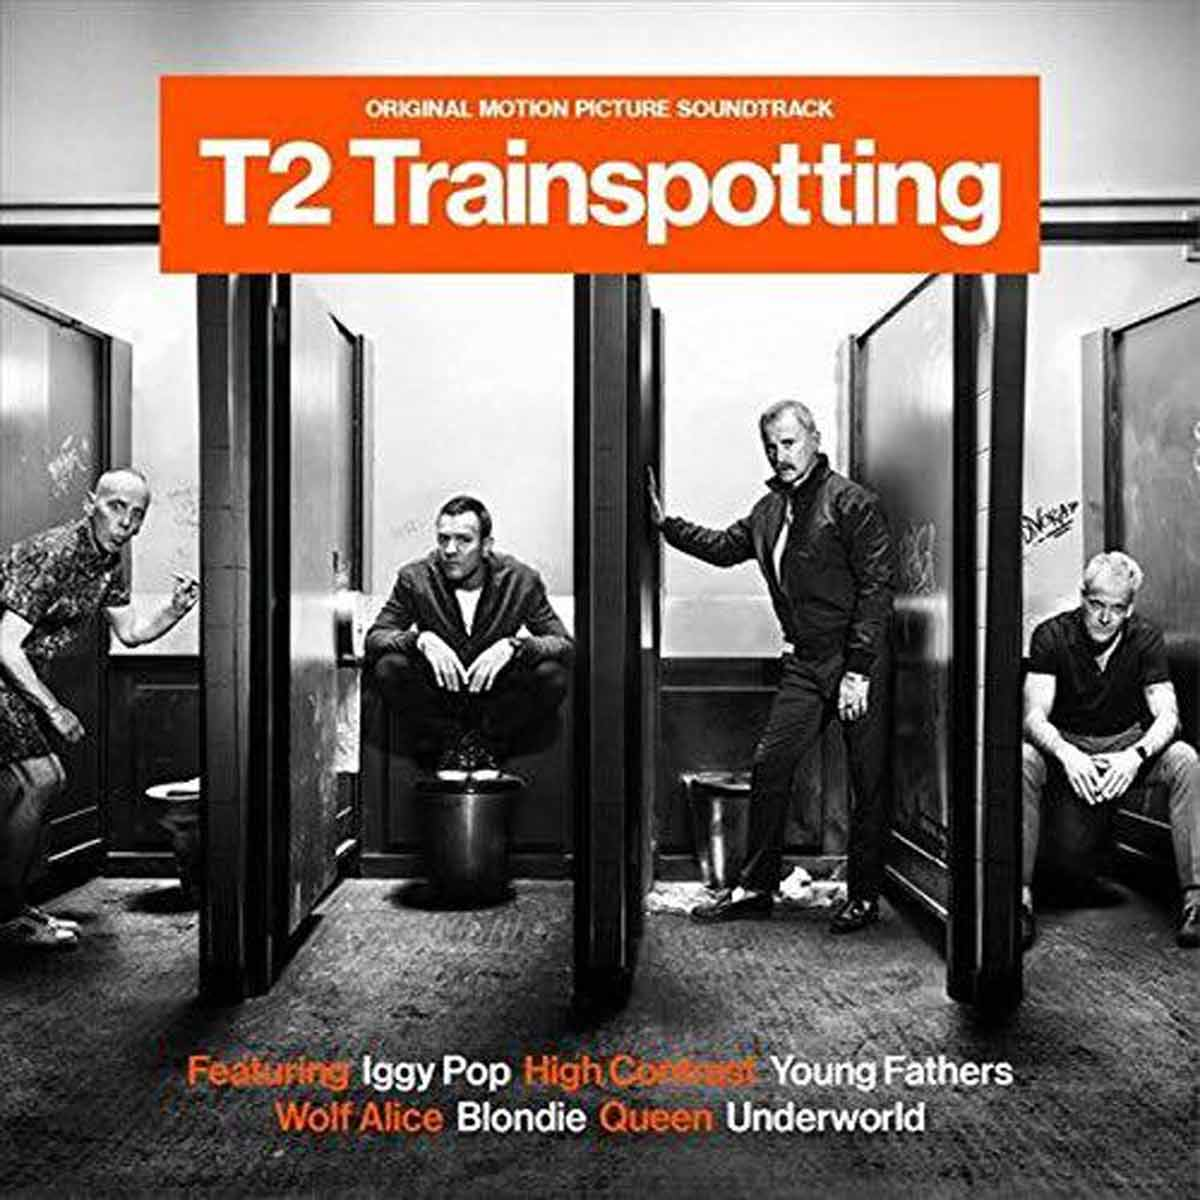 AA.VV.-T2 Trainspotting 2 (Original Motion Soundtrack)